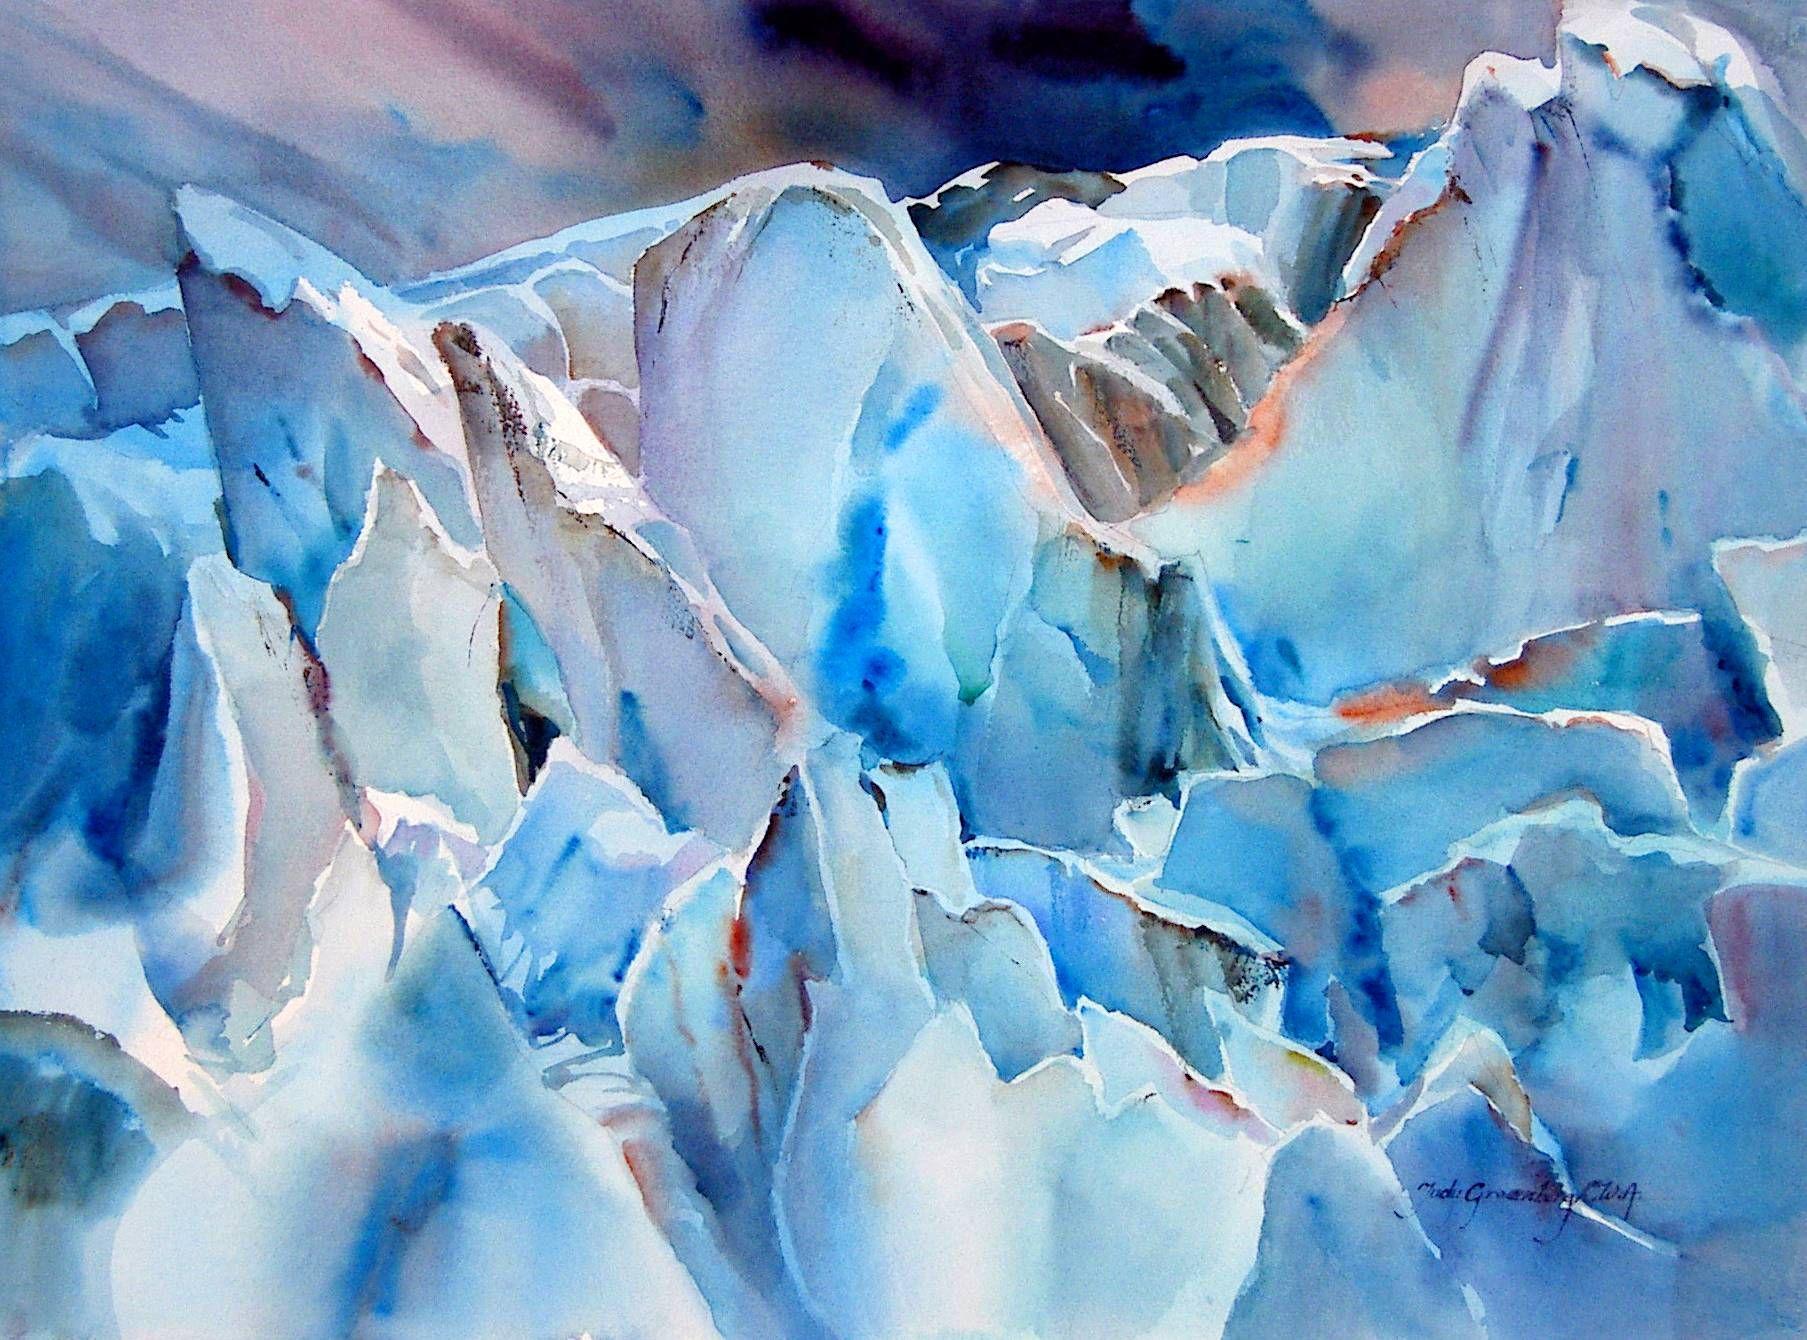 Additional Gallery Winter Watercolor Watercolor Art Beautiful Art